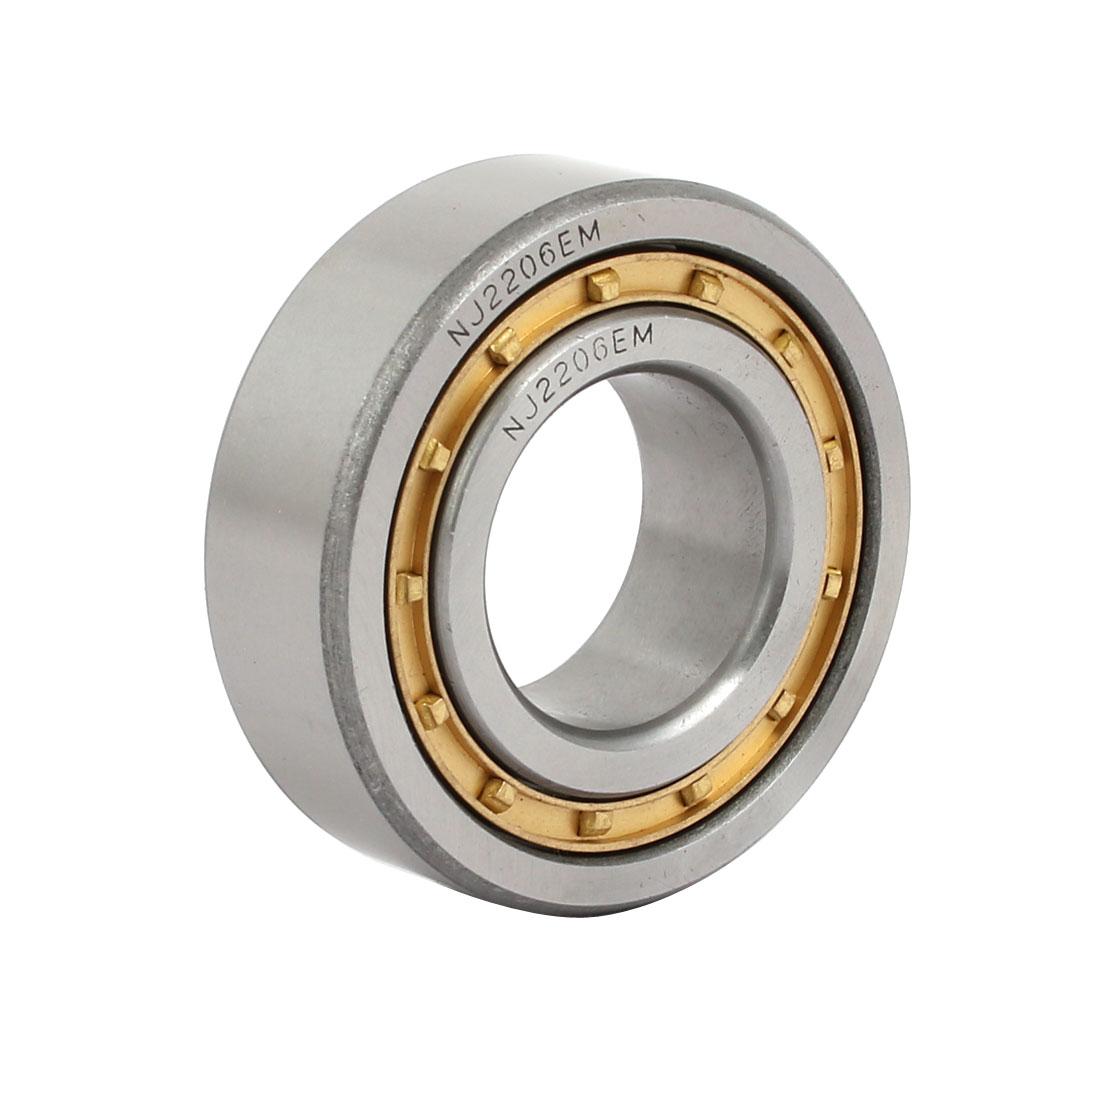 NJ2206EM 62mmx30mmx20mm Single Row Cylindrical Roller Bearing